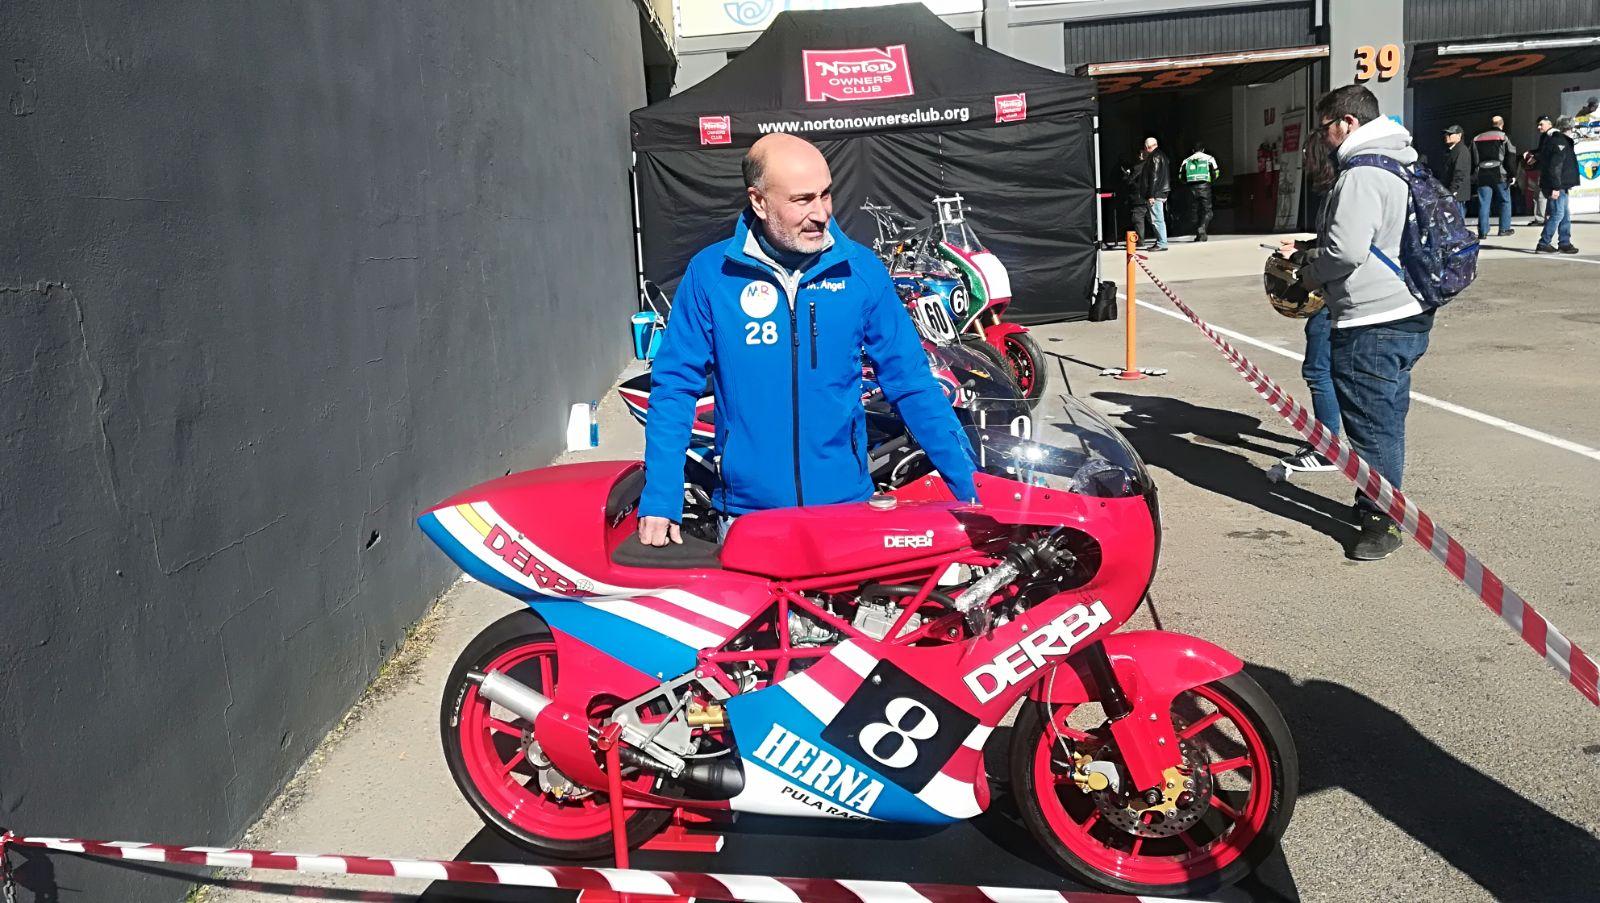 Replica Derbi 125 Moto Herna 2py418l